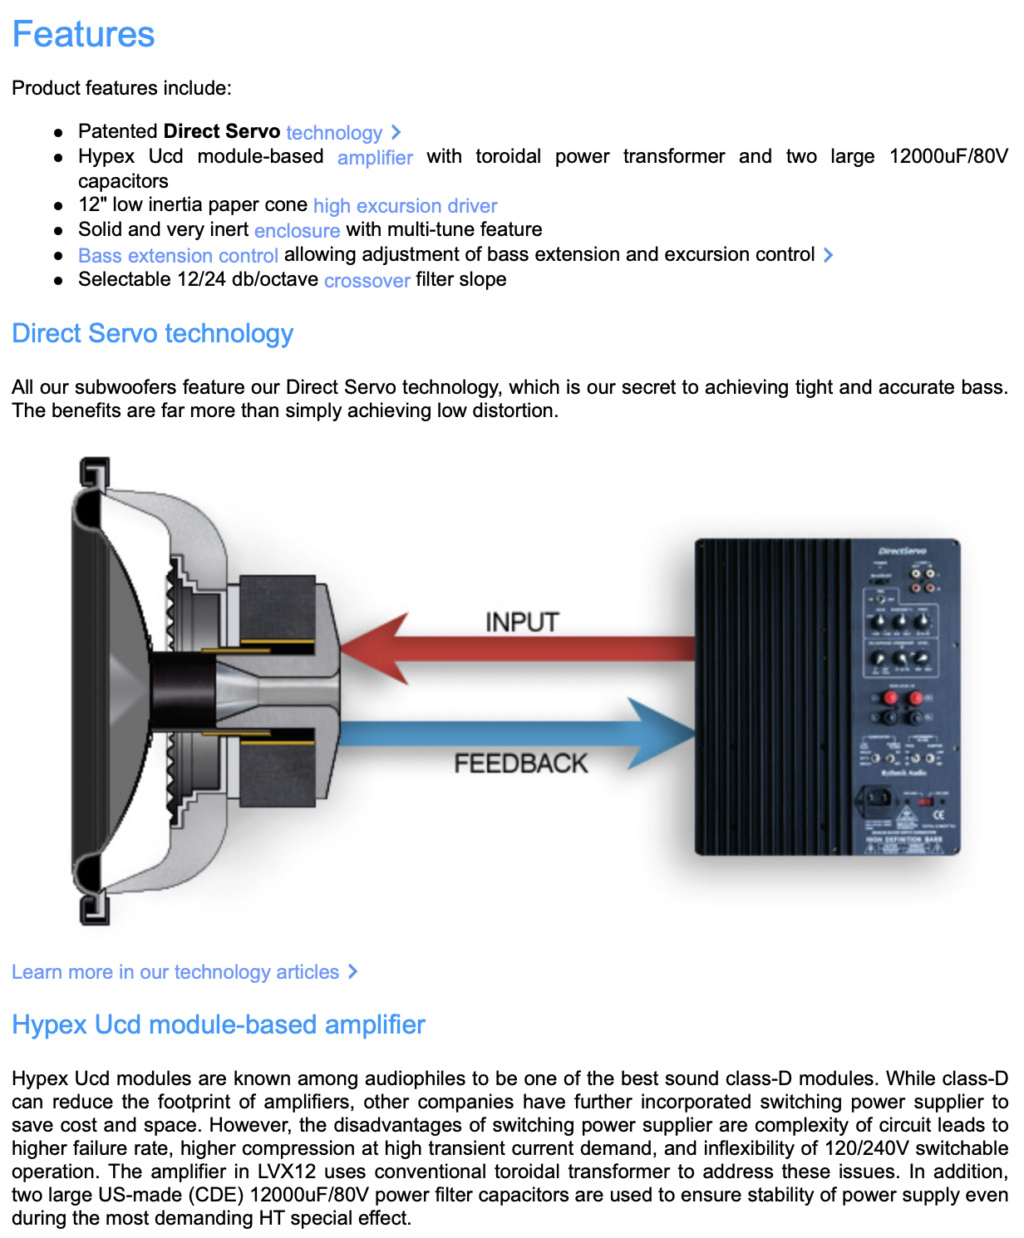 LVX12 Direct Servo Subwoofer 12″ multi-tuned ported audiophile sub Screen77